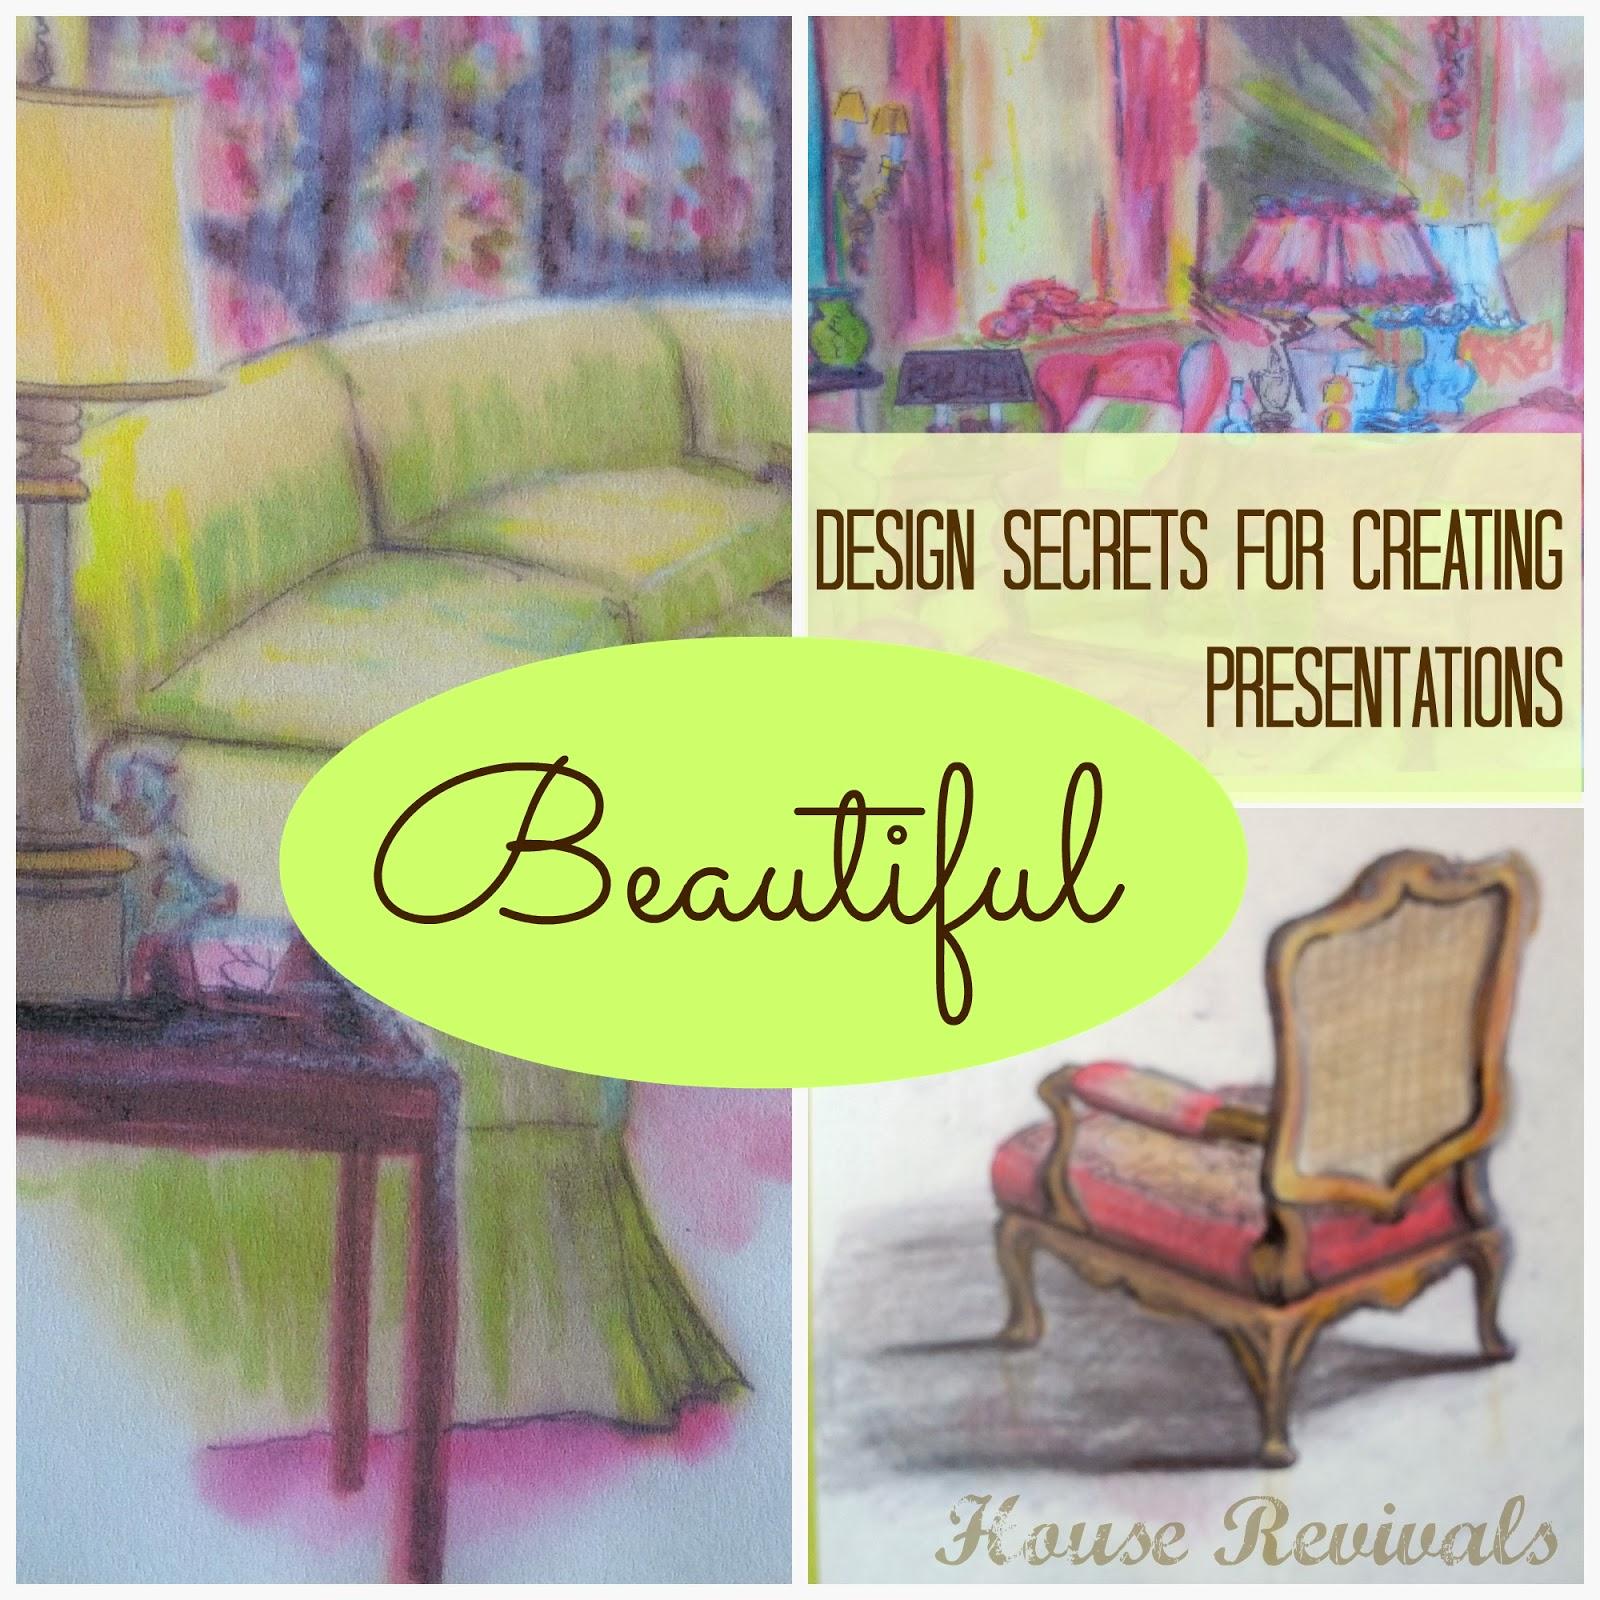 House Revivals: Design Secrets for Creating Beautiful Presentations